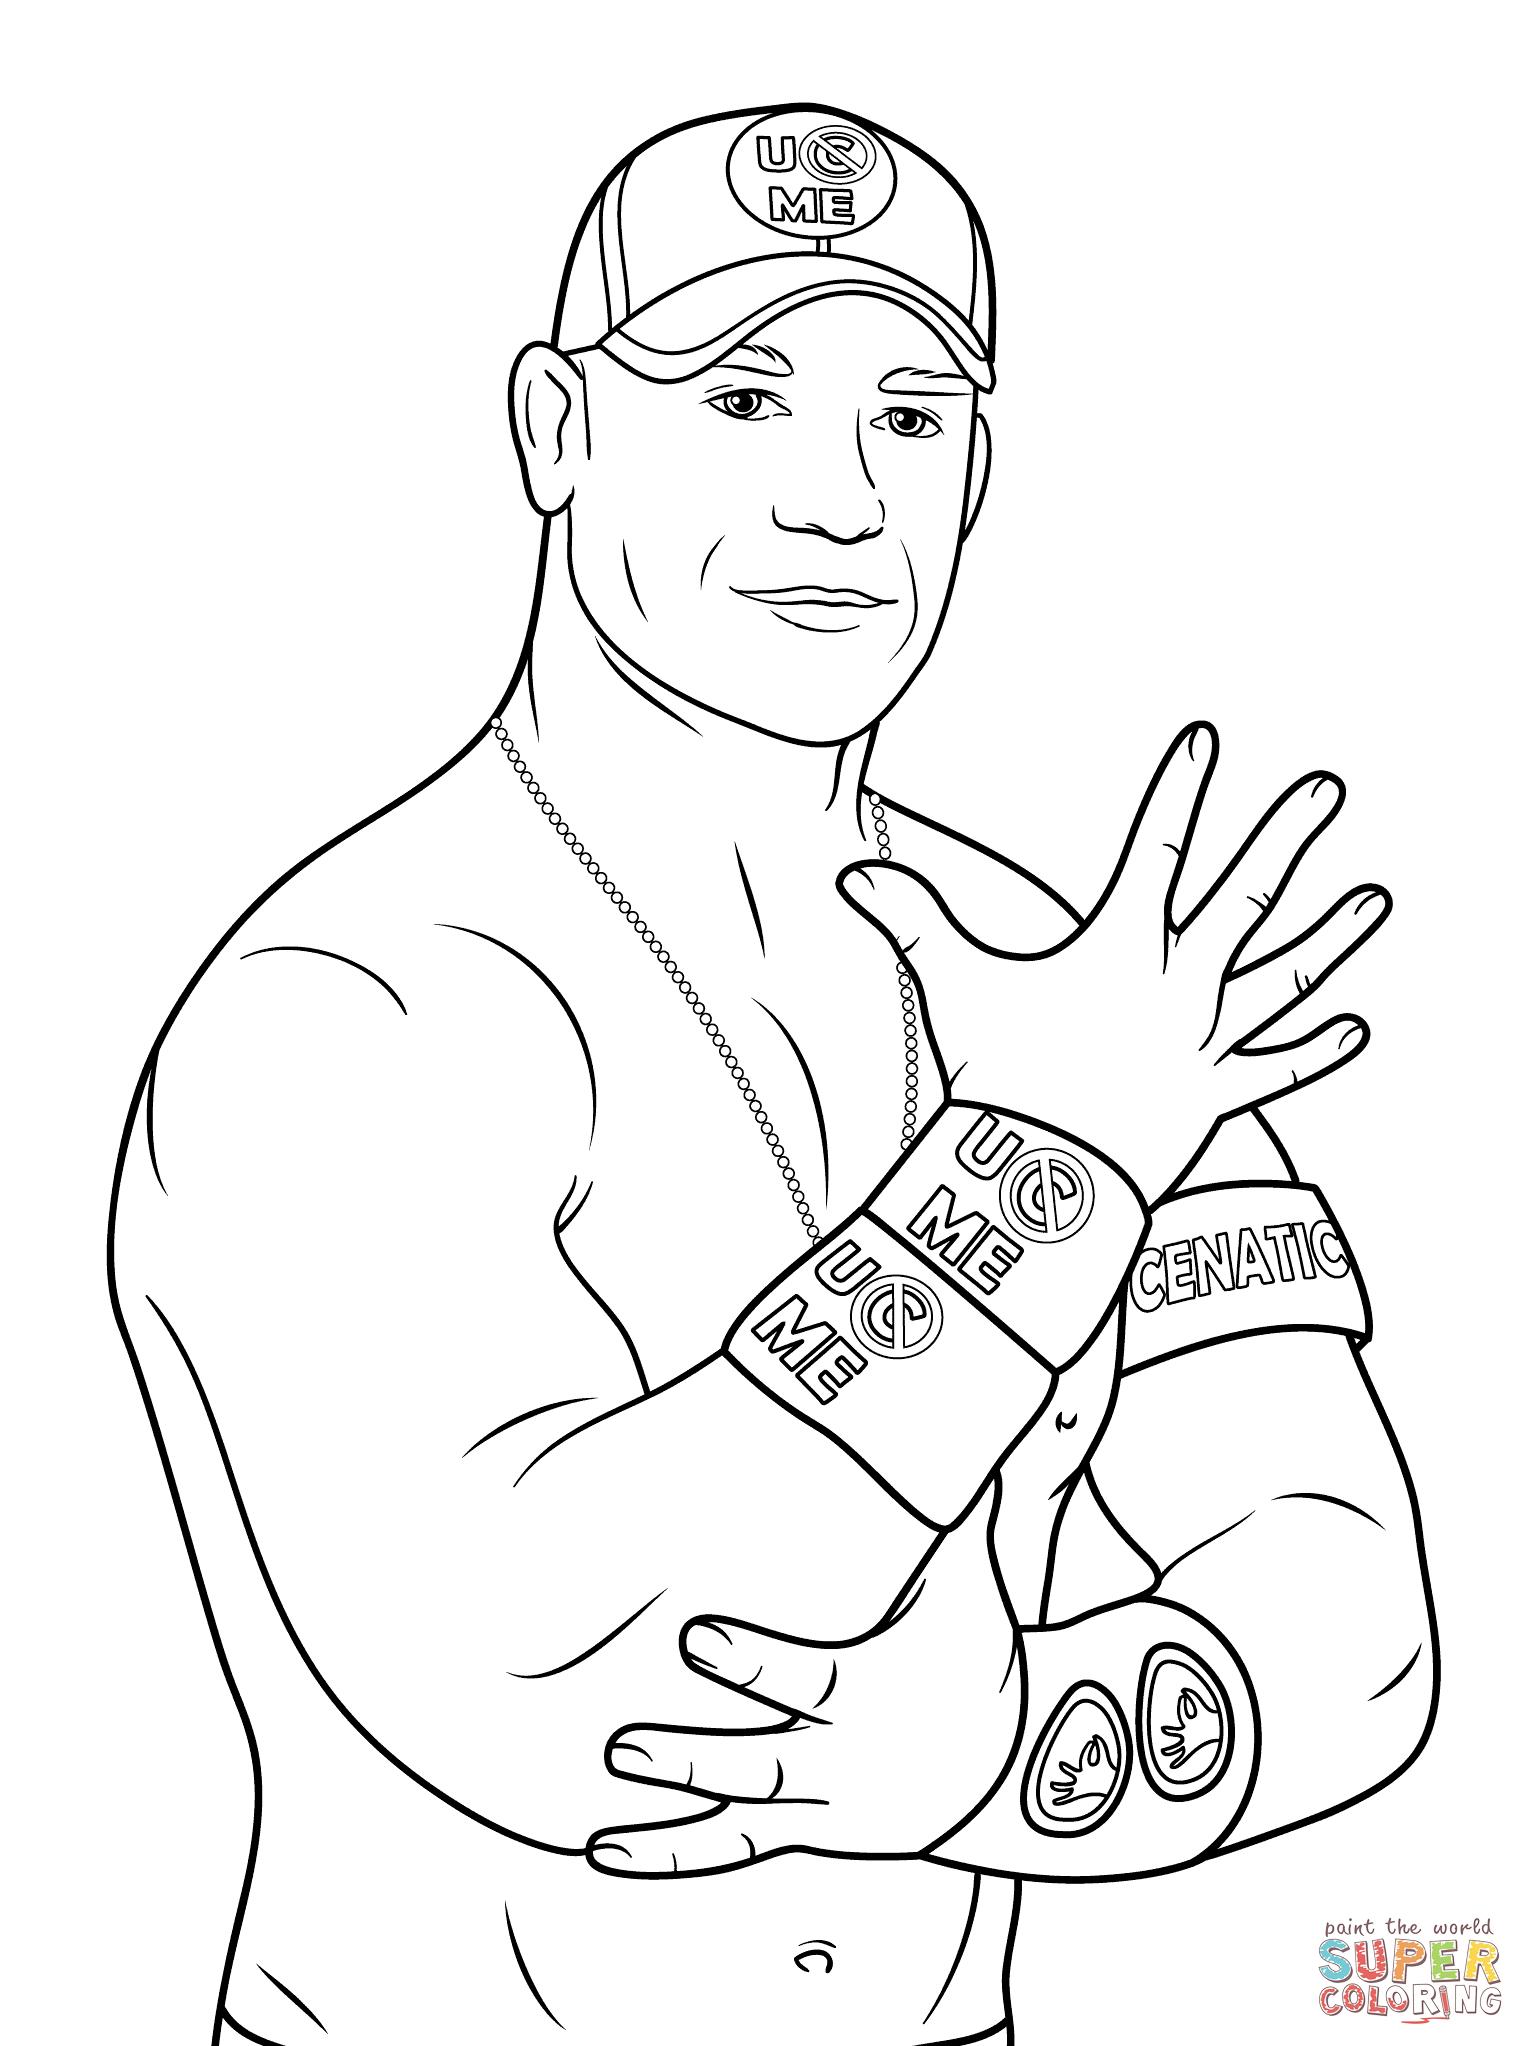 John Cena Coloring Page | Free Printable Coloring Pages - Wwe Colouring Pages Free Printable